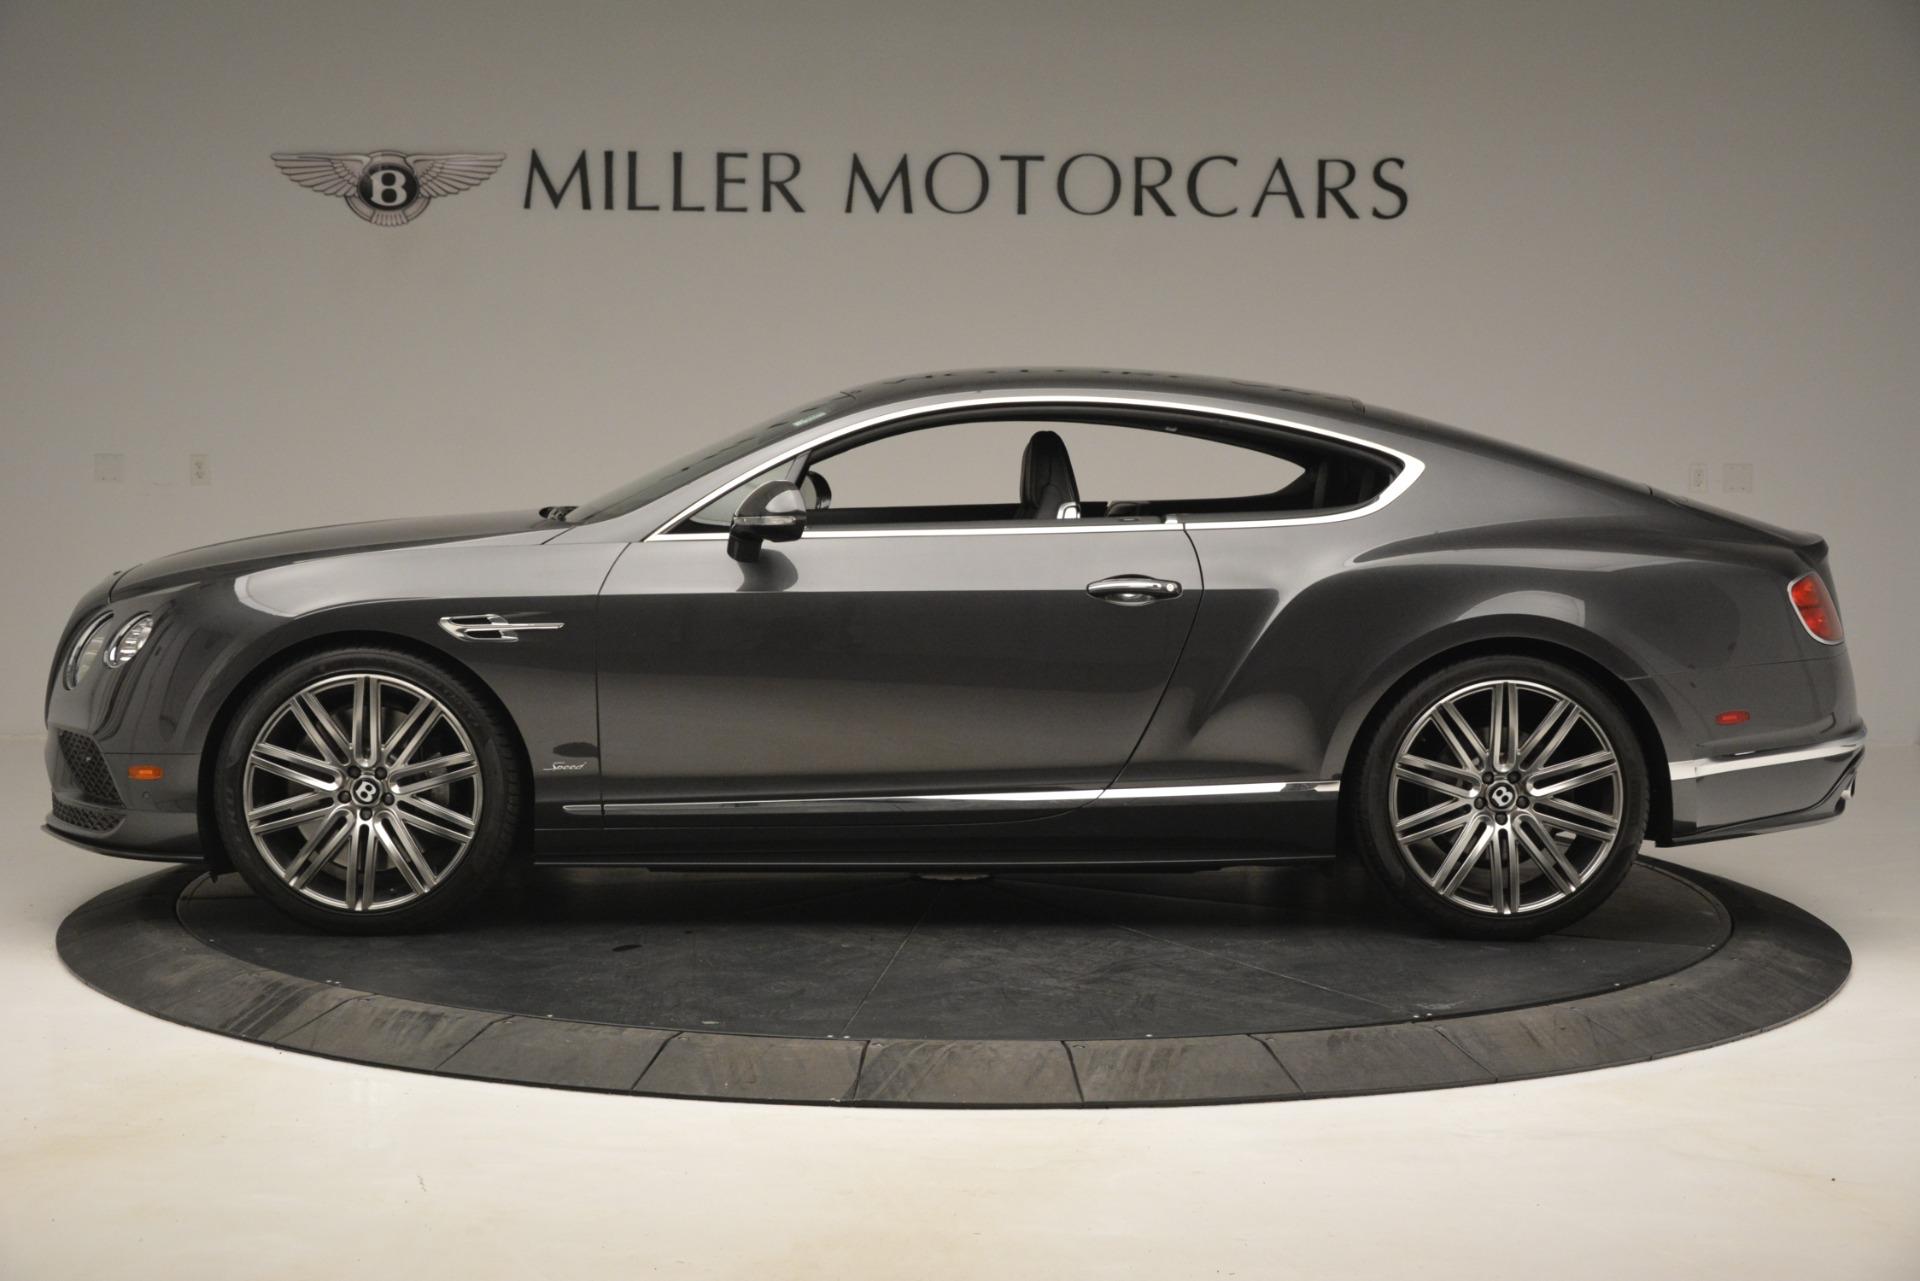 Used 2016 Bentley Continental GT Speed For Sale In Westport, CT 2953_p3